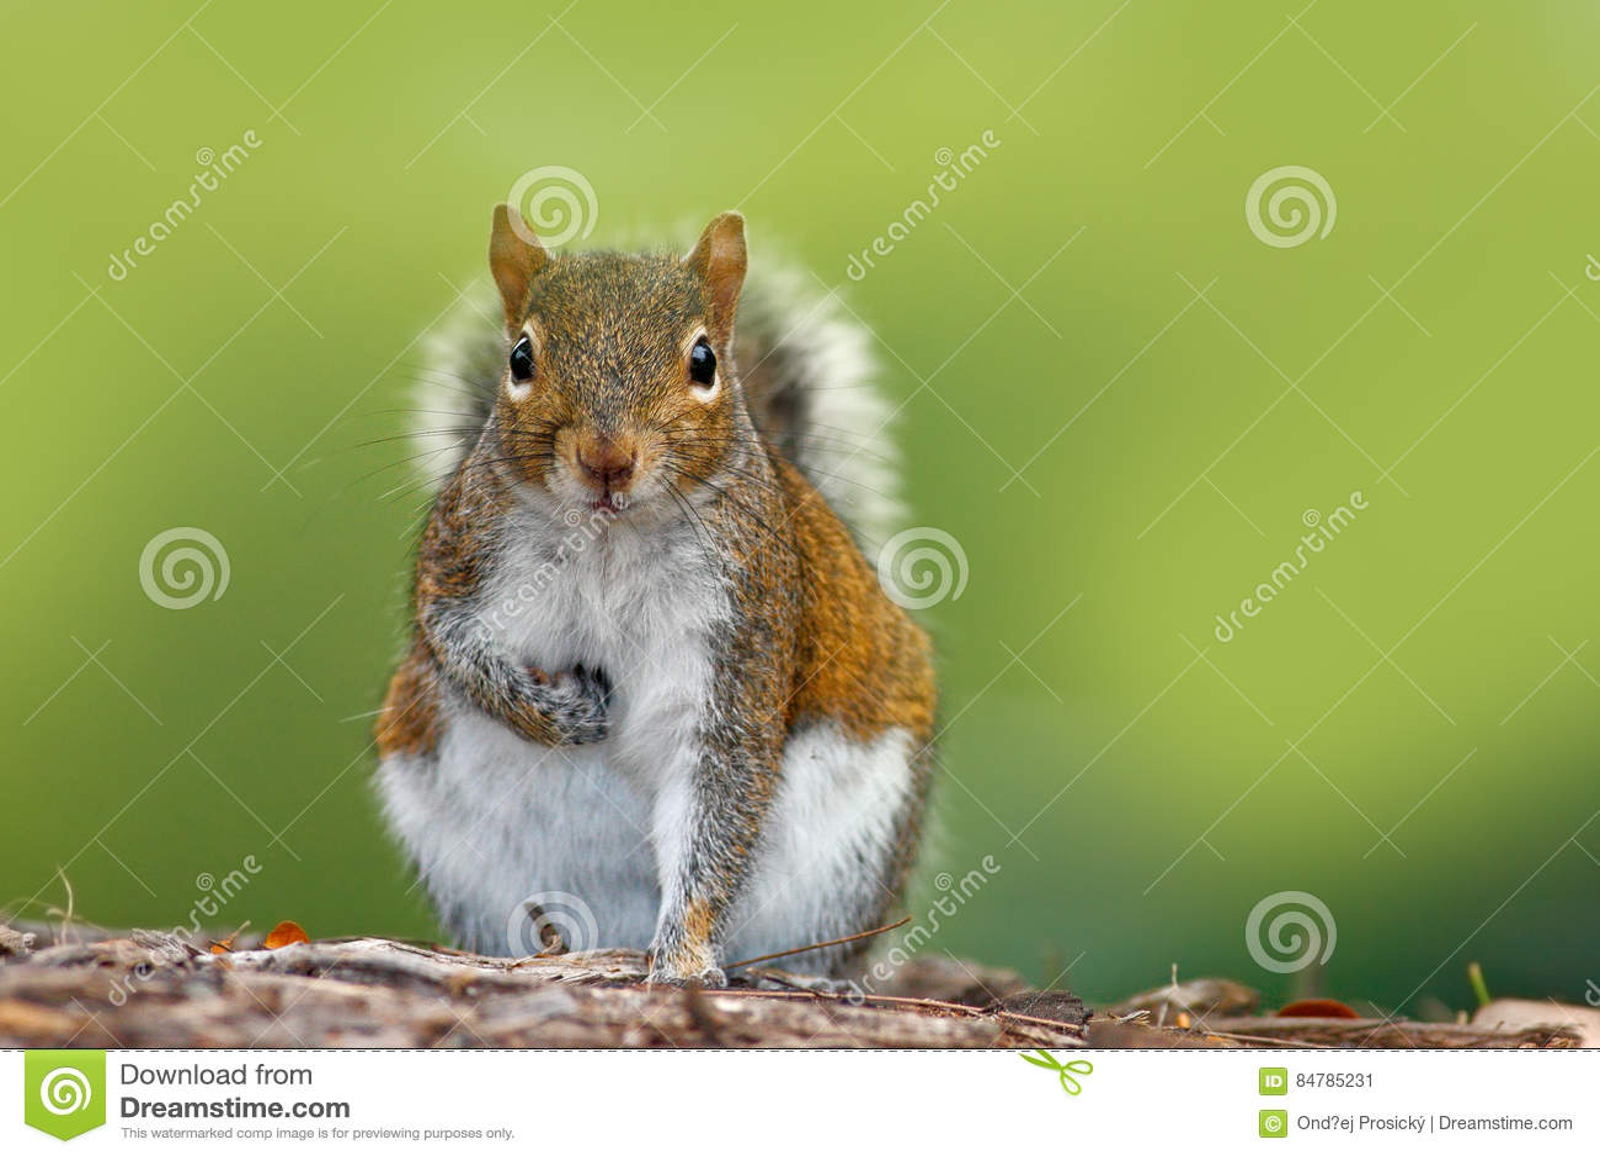 Funny image from wild nature. Gray Squirrel, Sciurus carolinensis, cute animal in the forest ground, Florida, USA. Squirrel sittin